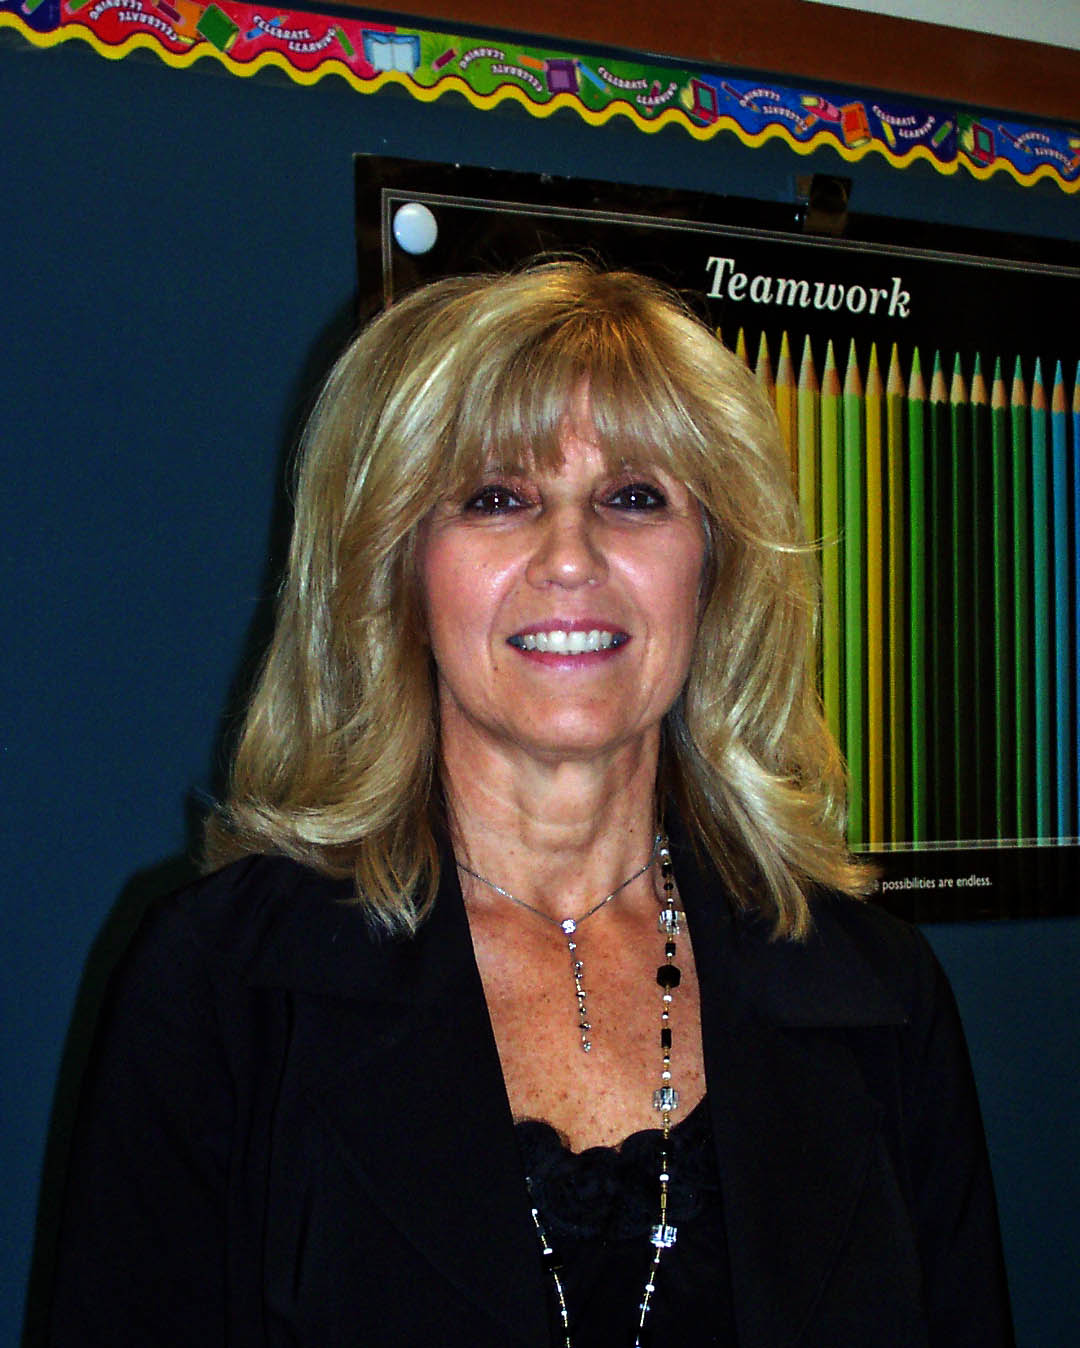 Ms. Mitrakas